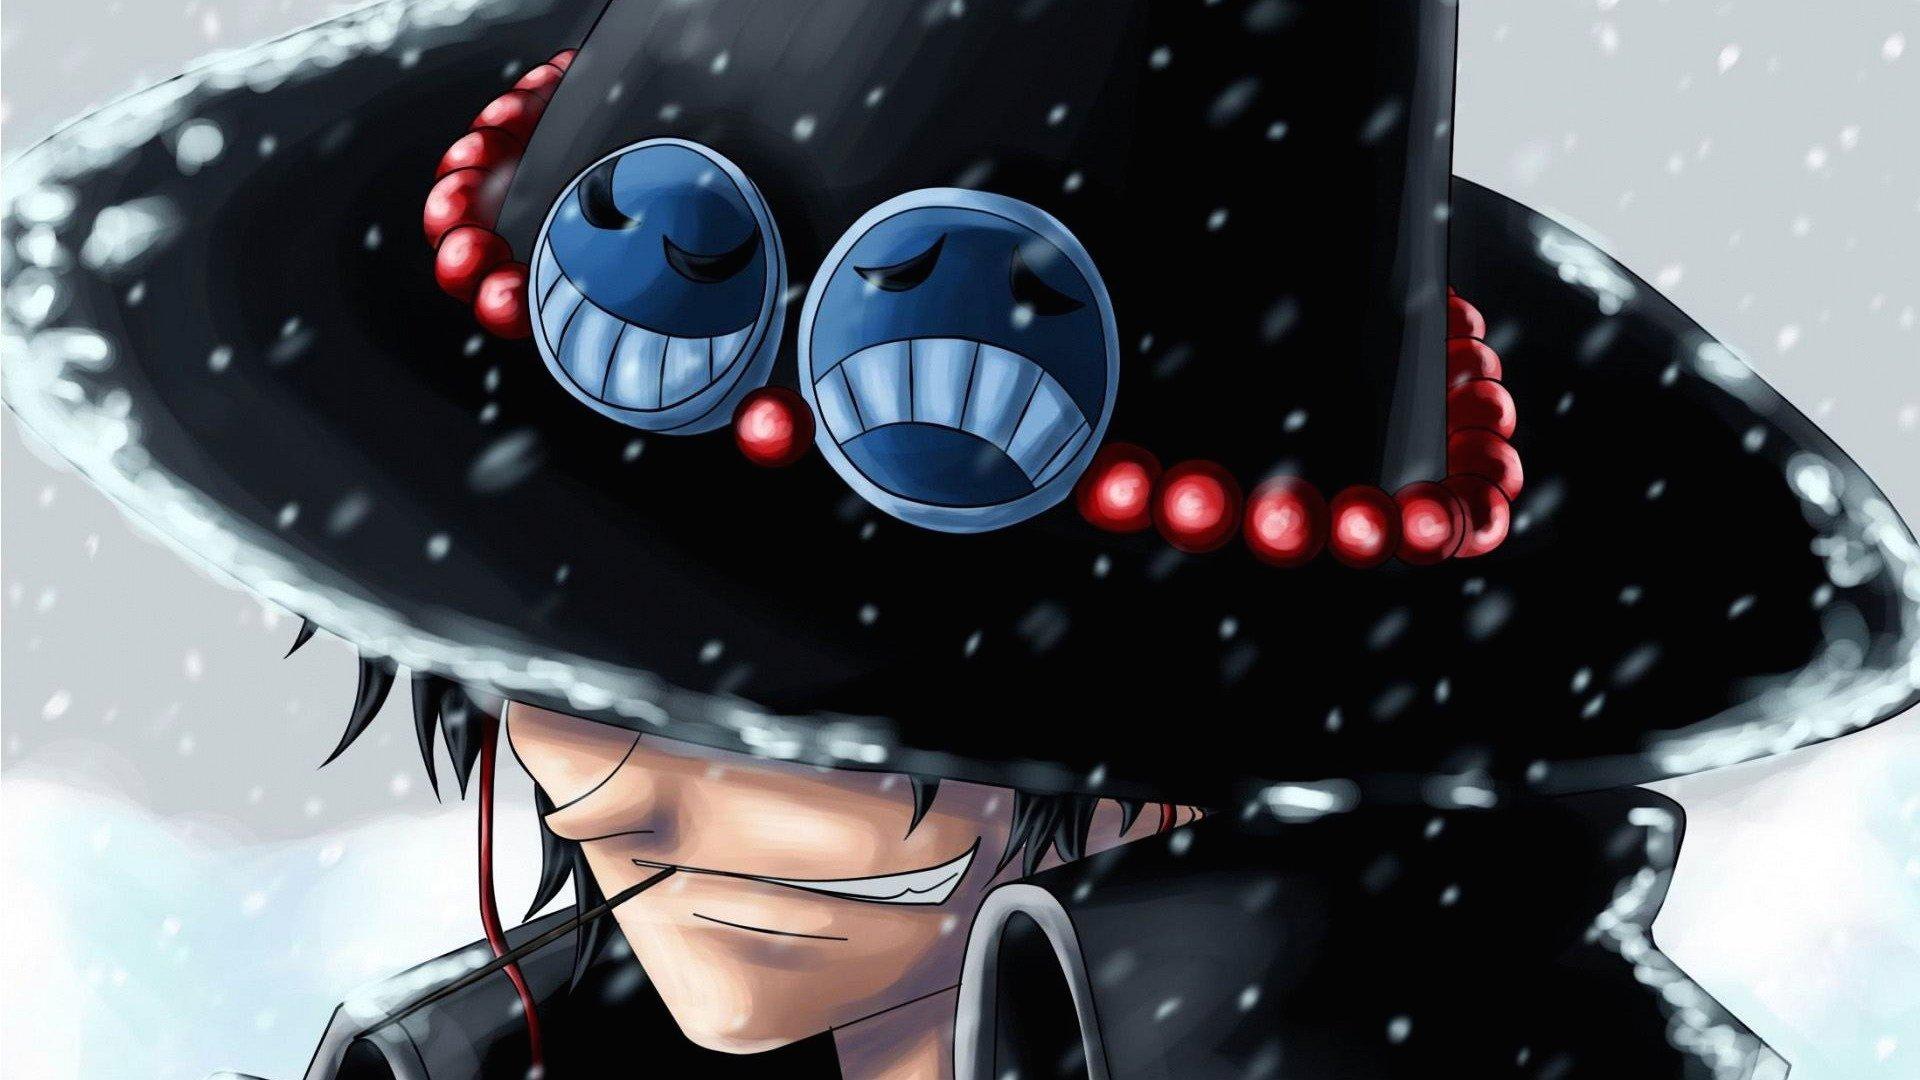 Awesome Anime Backgrounds - WallpaperSafari